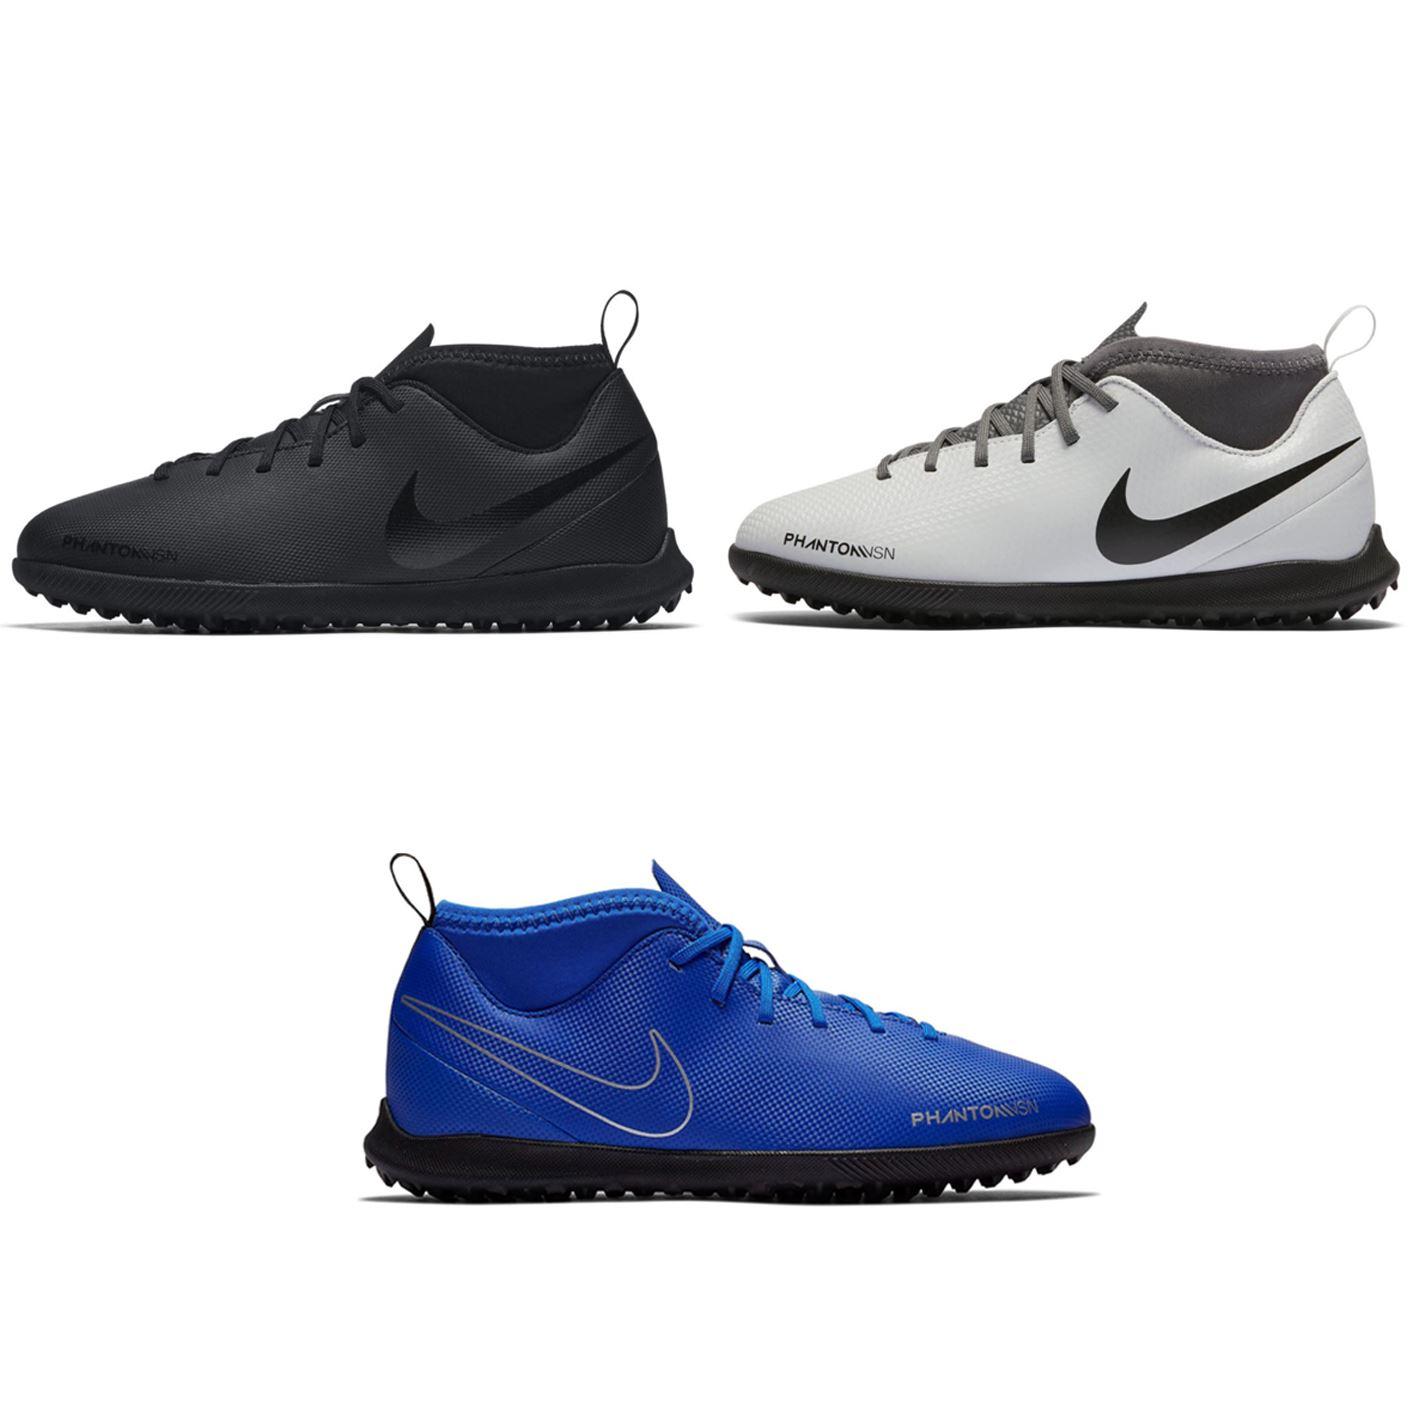 f902858f5a12 ... Nike Phantom Vision Club DF Astro Turf Football Trainers Childs Soccer  Shoes ...